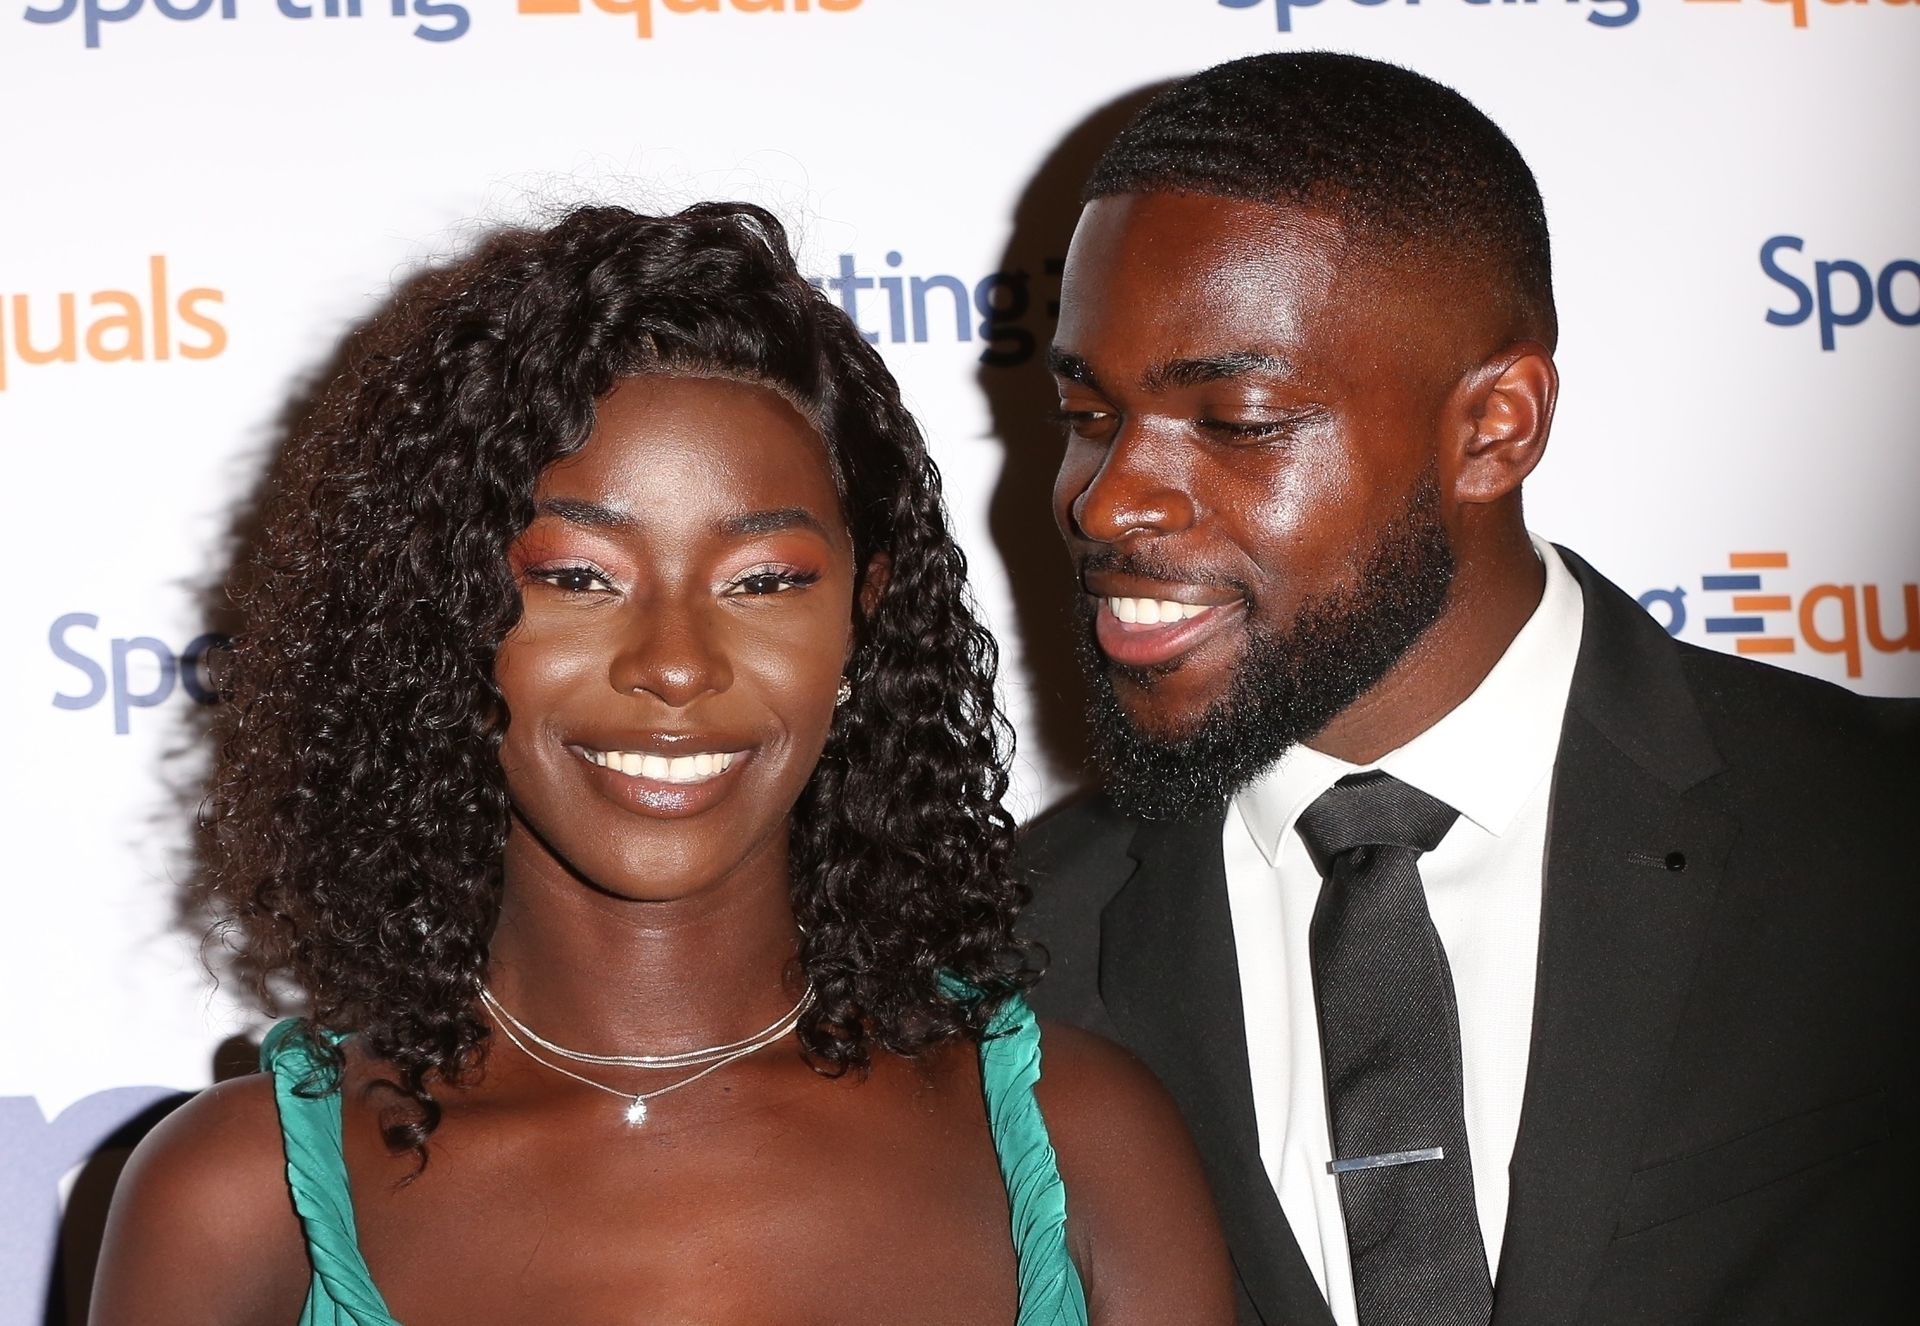 Mike Boateng & Priscilla Anyabu Are Seen At British Ethnic Diversity Sports Awards 0093